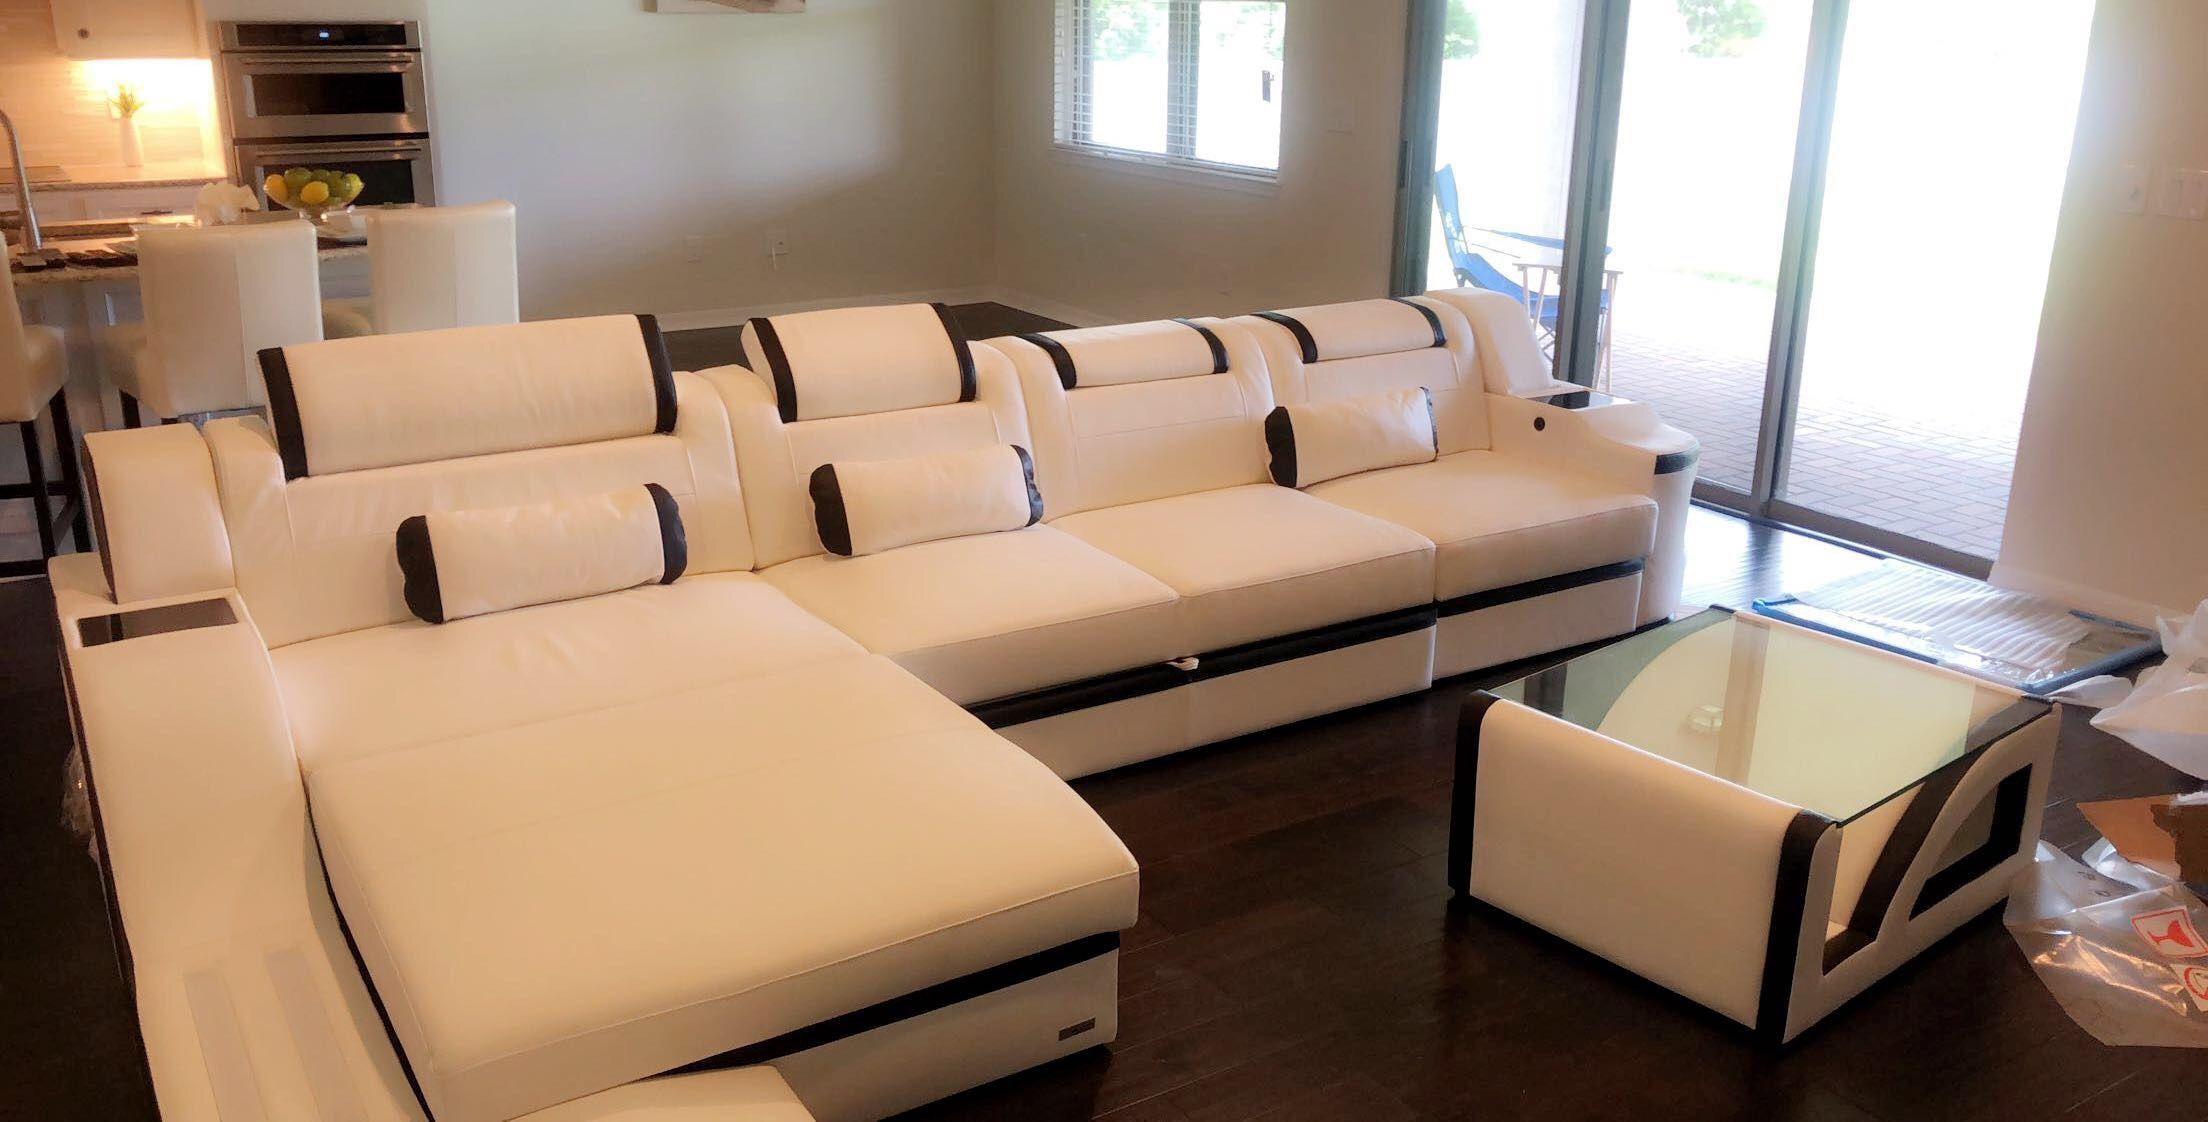 Sectional Leather Sofa Houston L Shape Leather Sofa Leather Sectional Sofas Modern Sofa Sectional